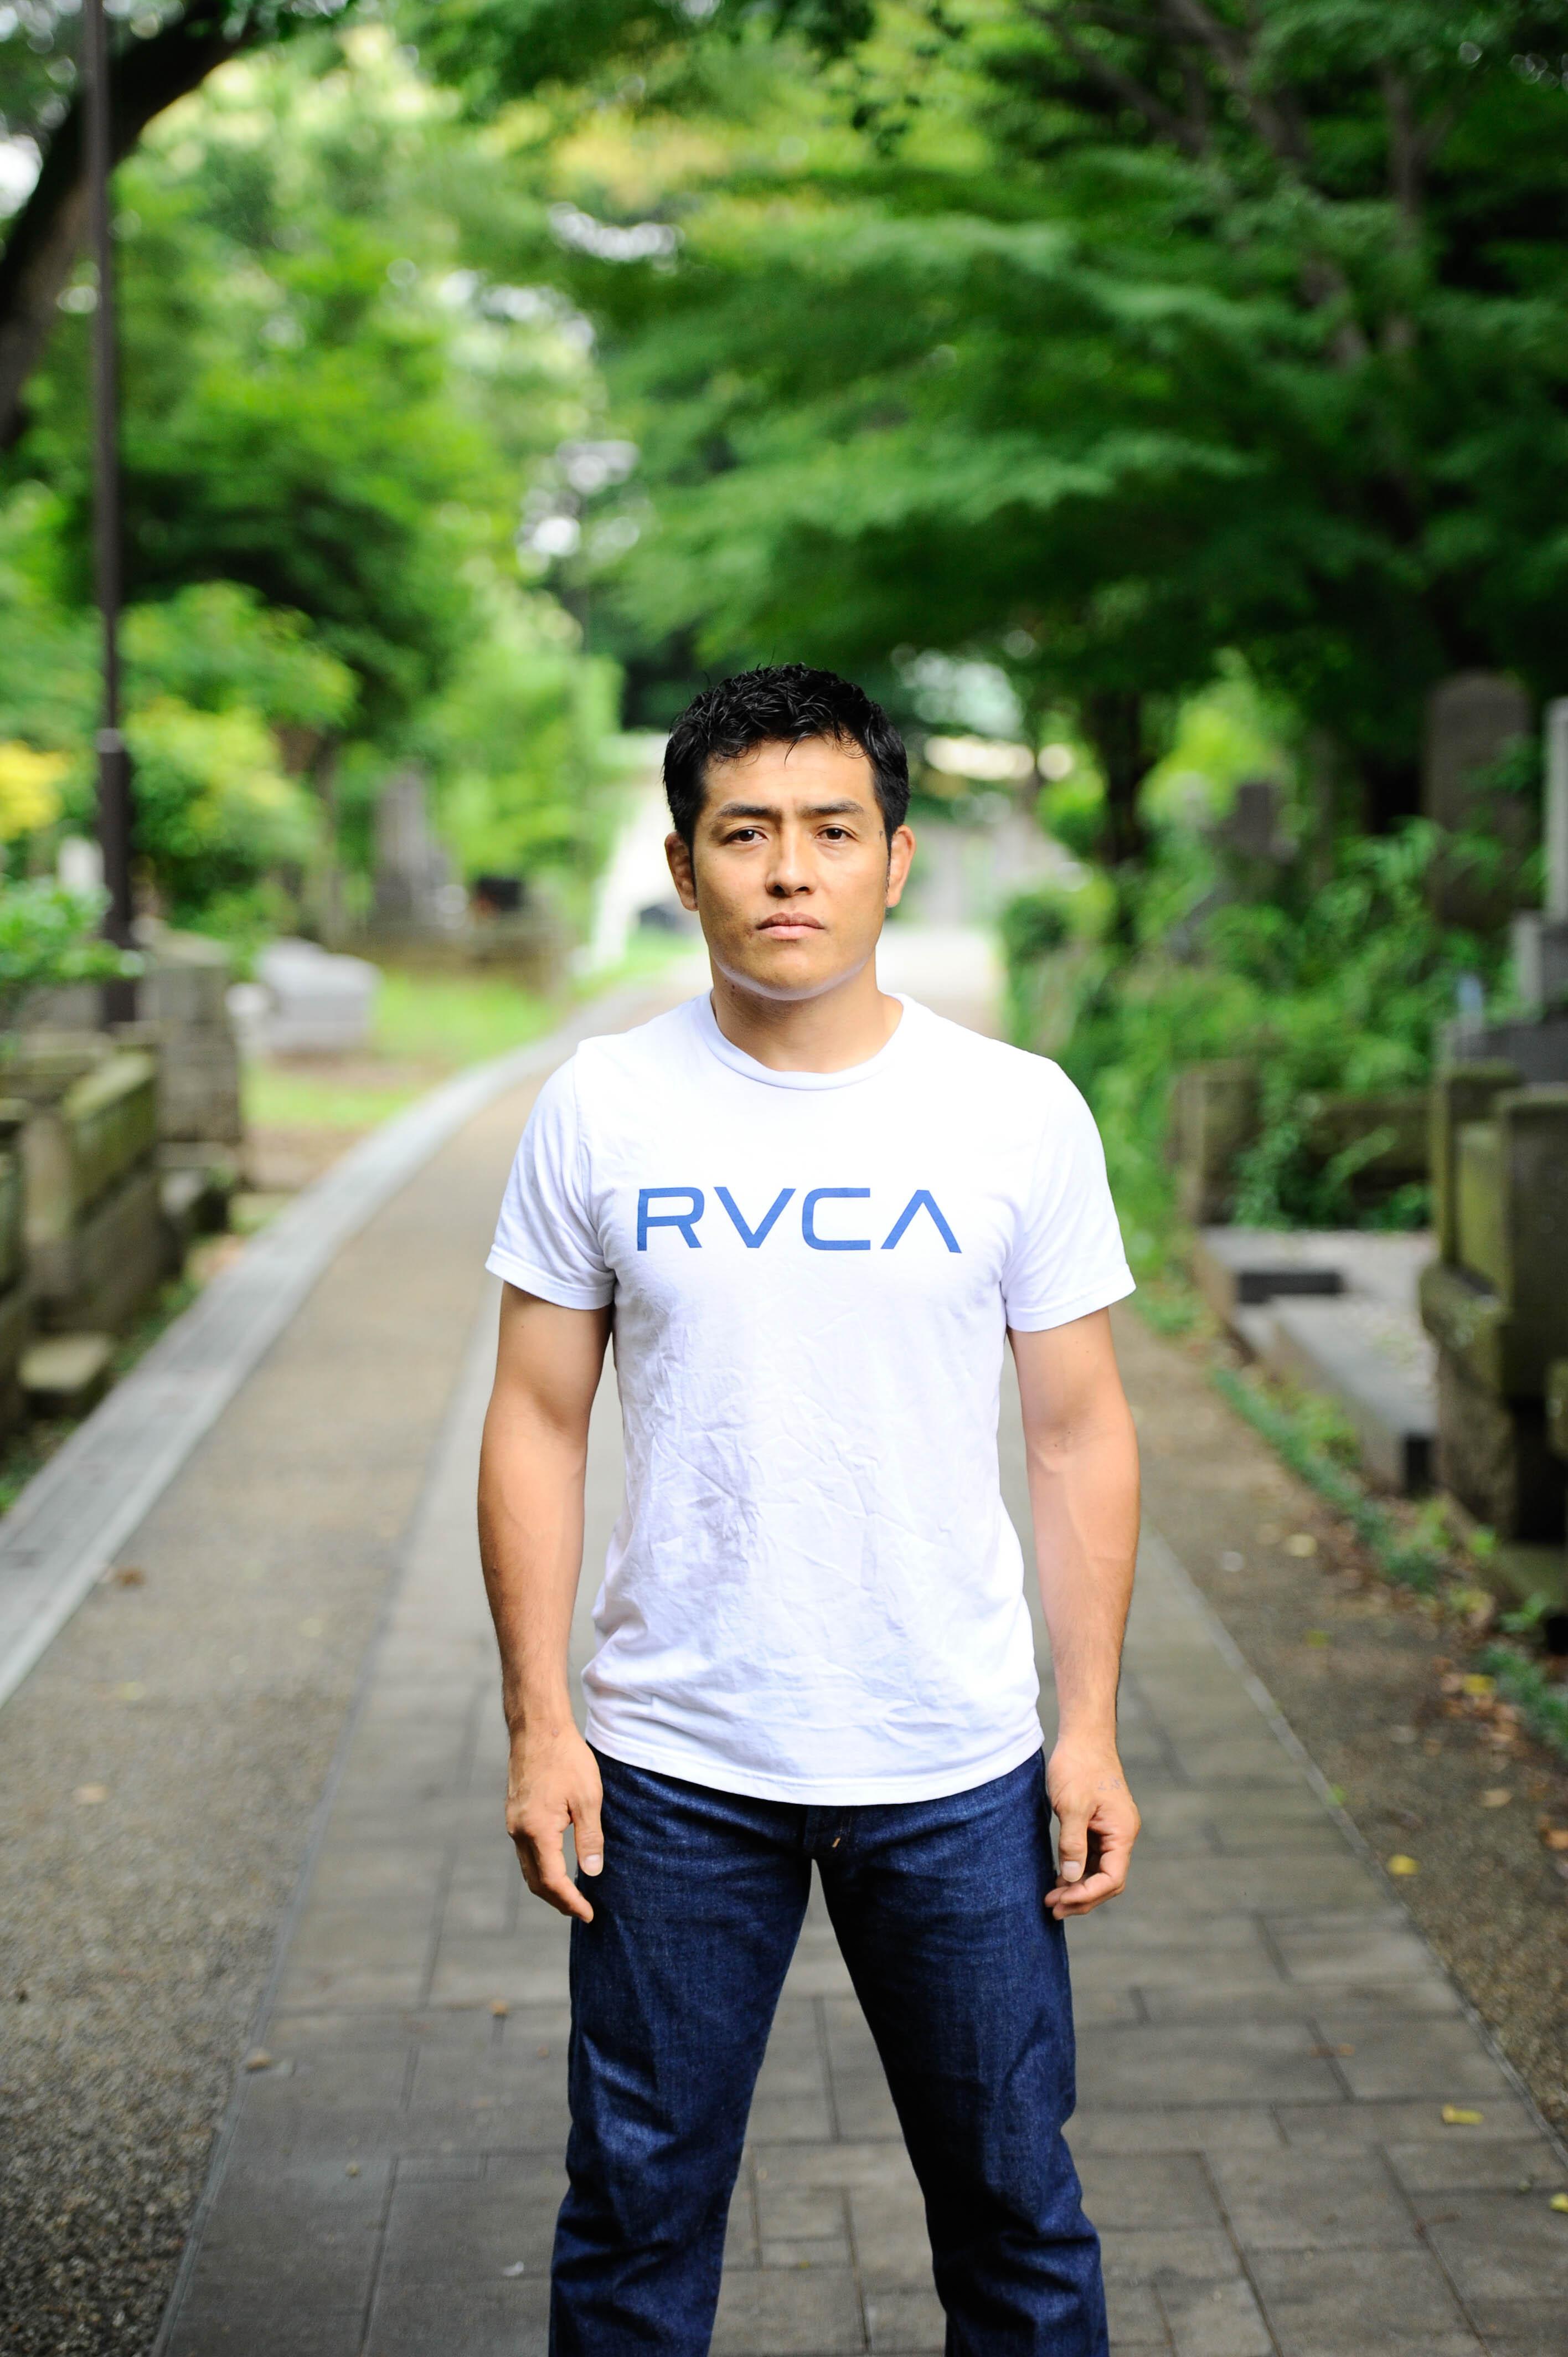 CARPE DIEM x RVCA の新作Tシャツ